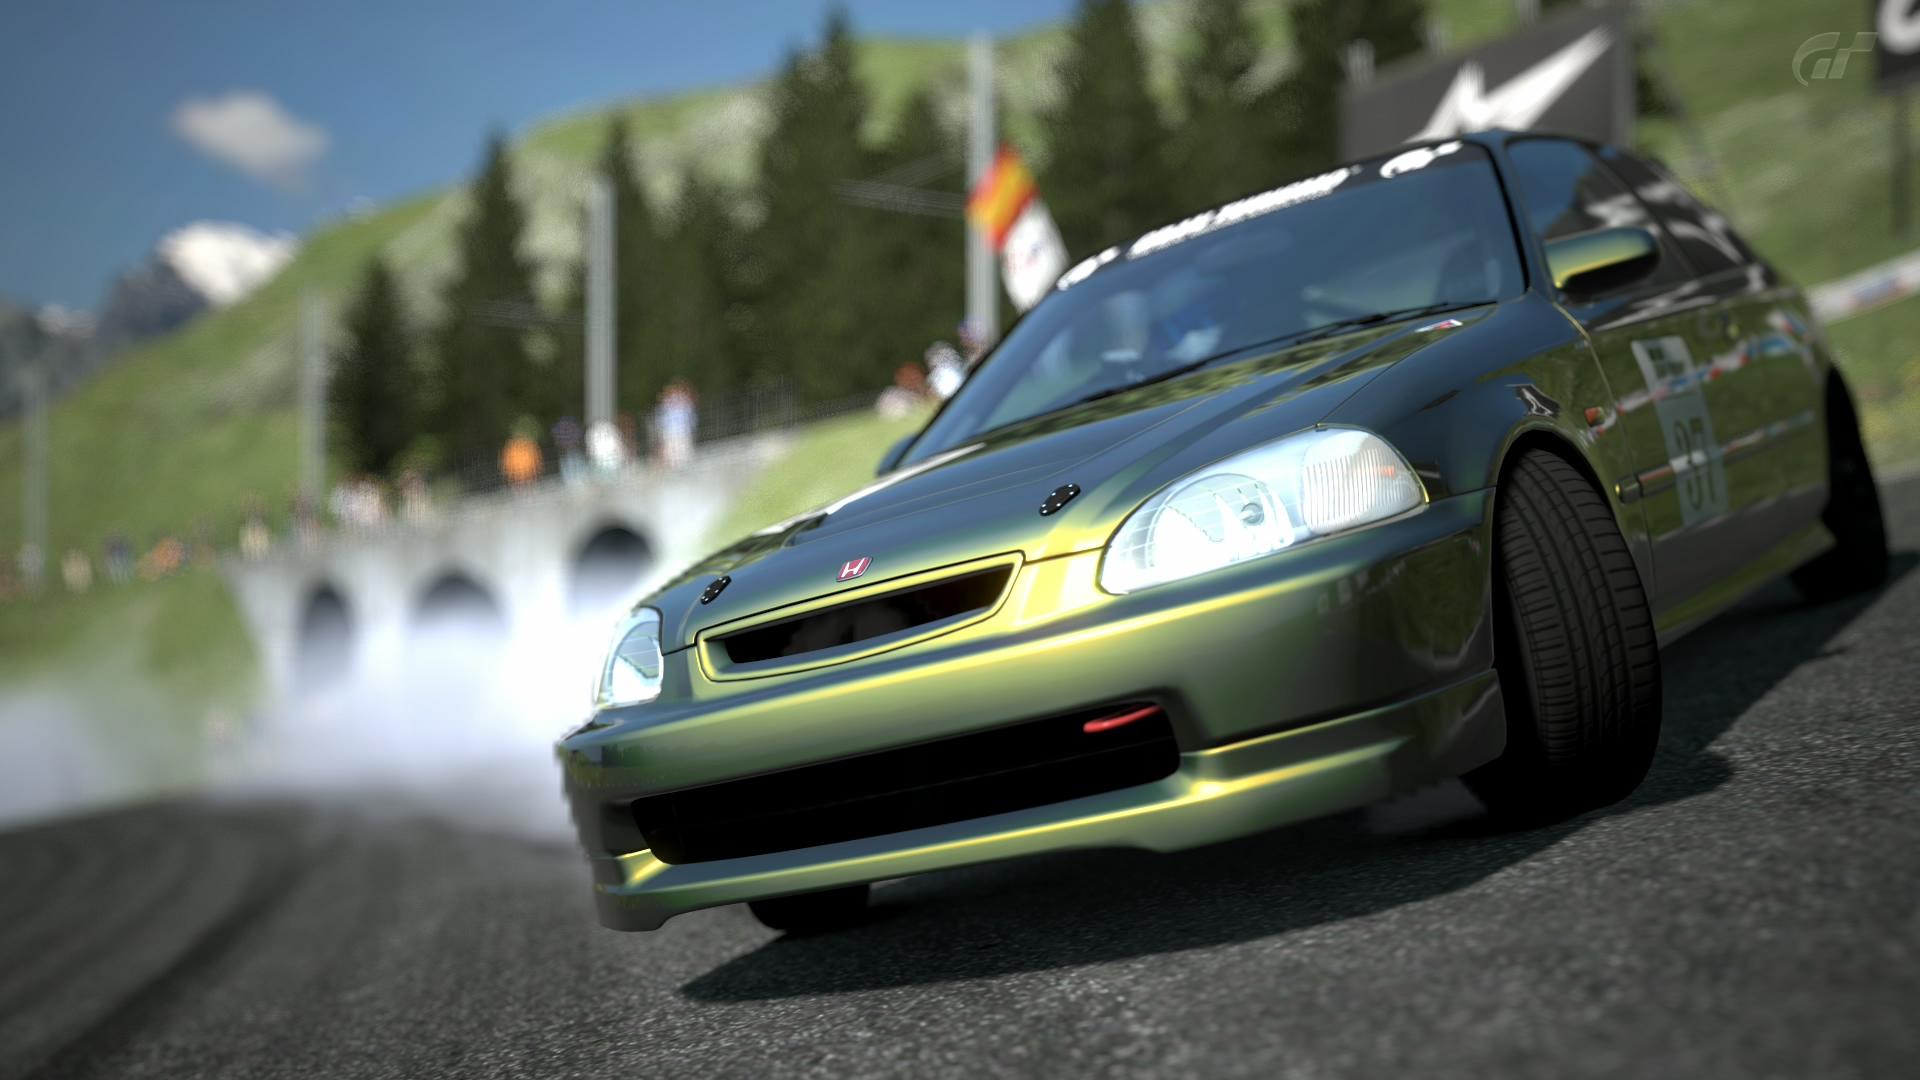 Honda Civic VTi-R Drift by Galactic-Rev on DeviantArt